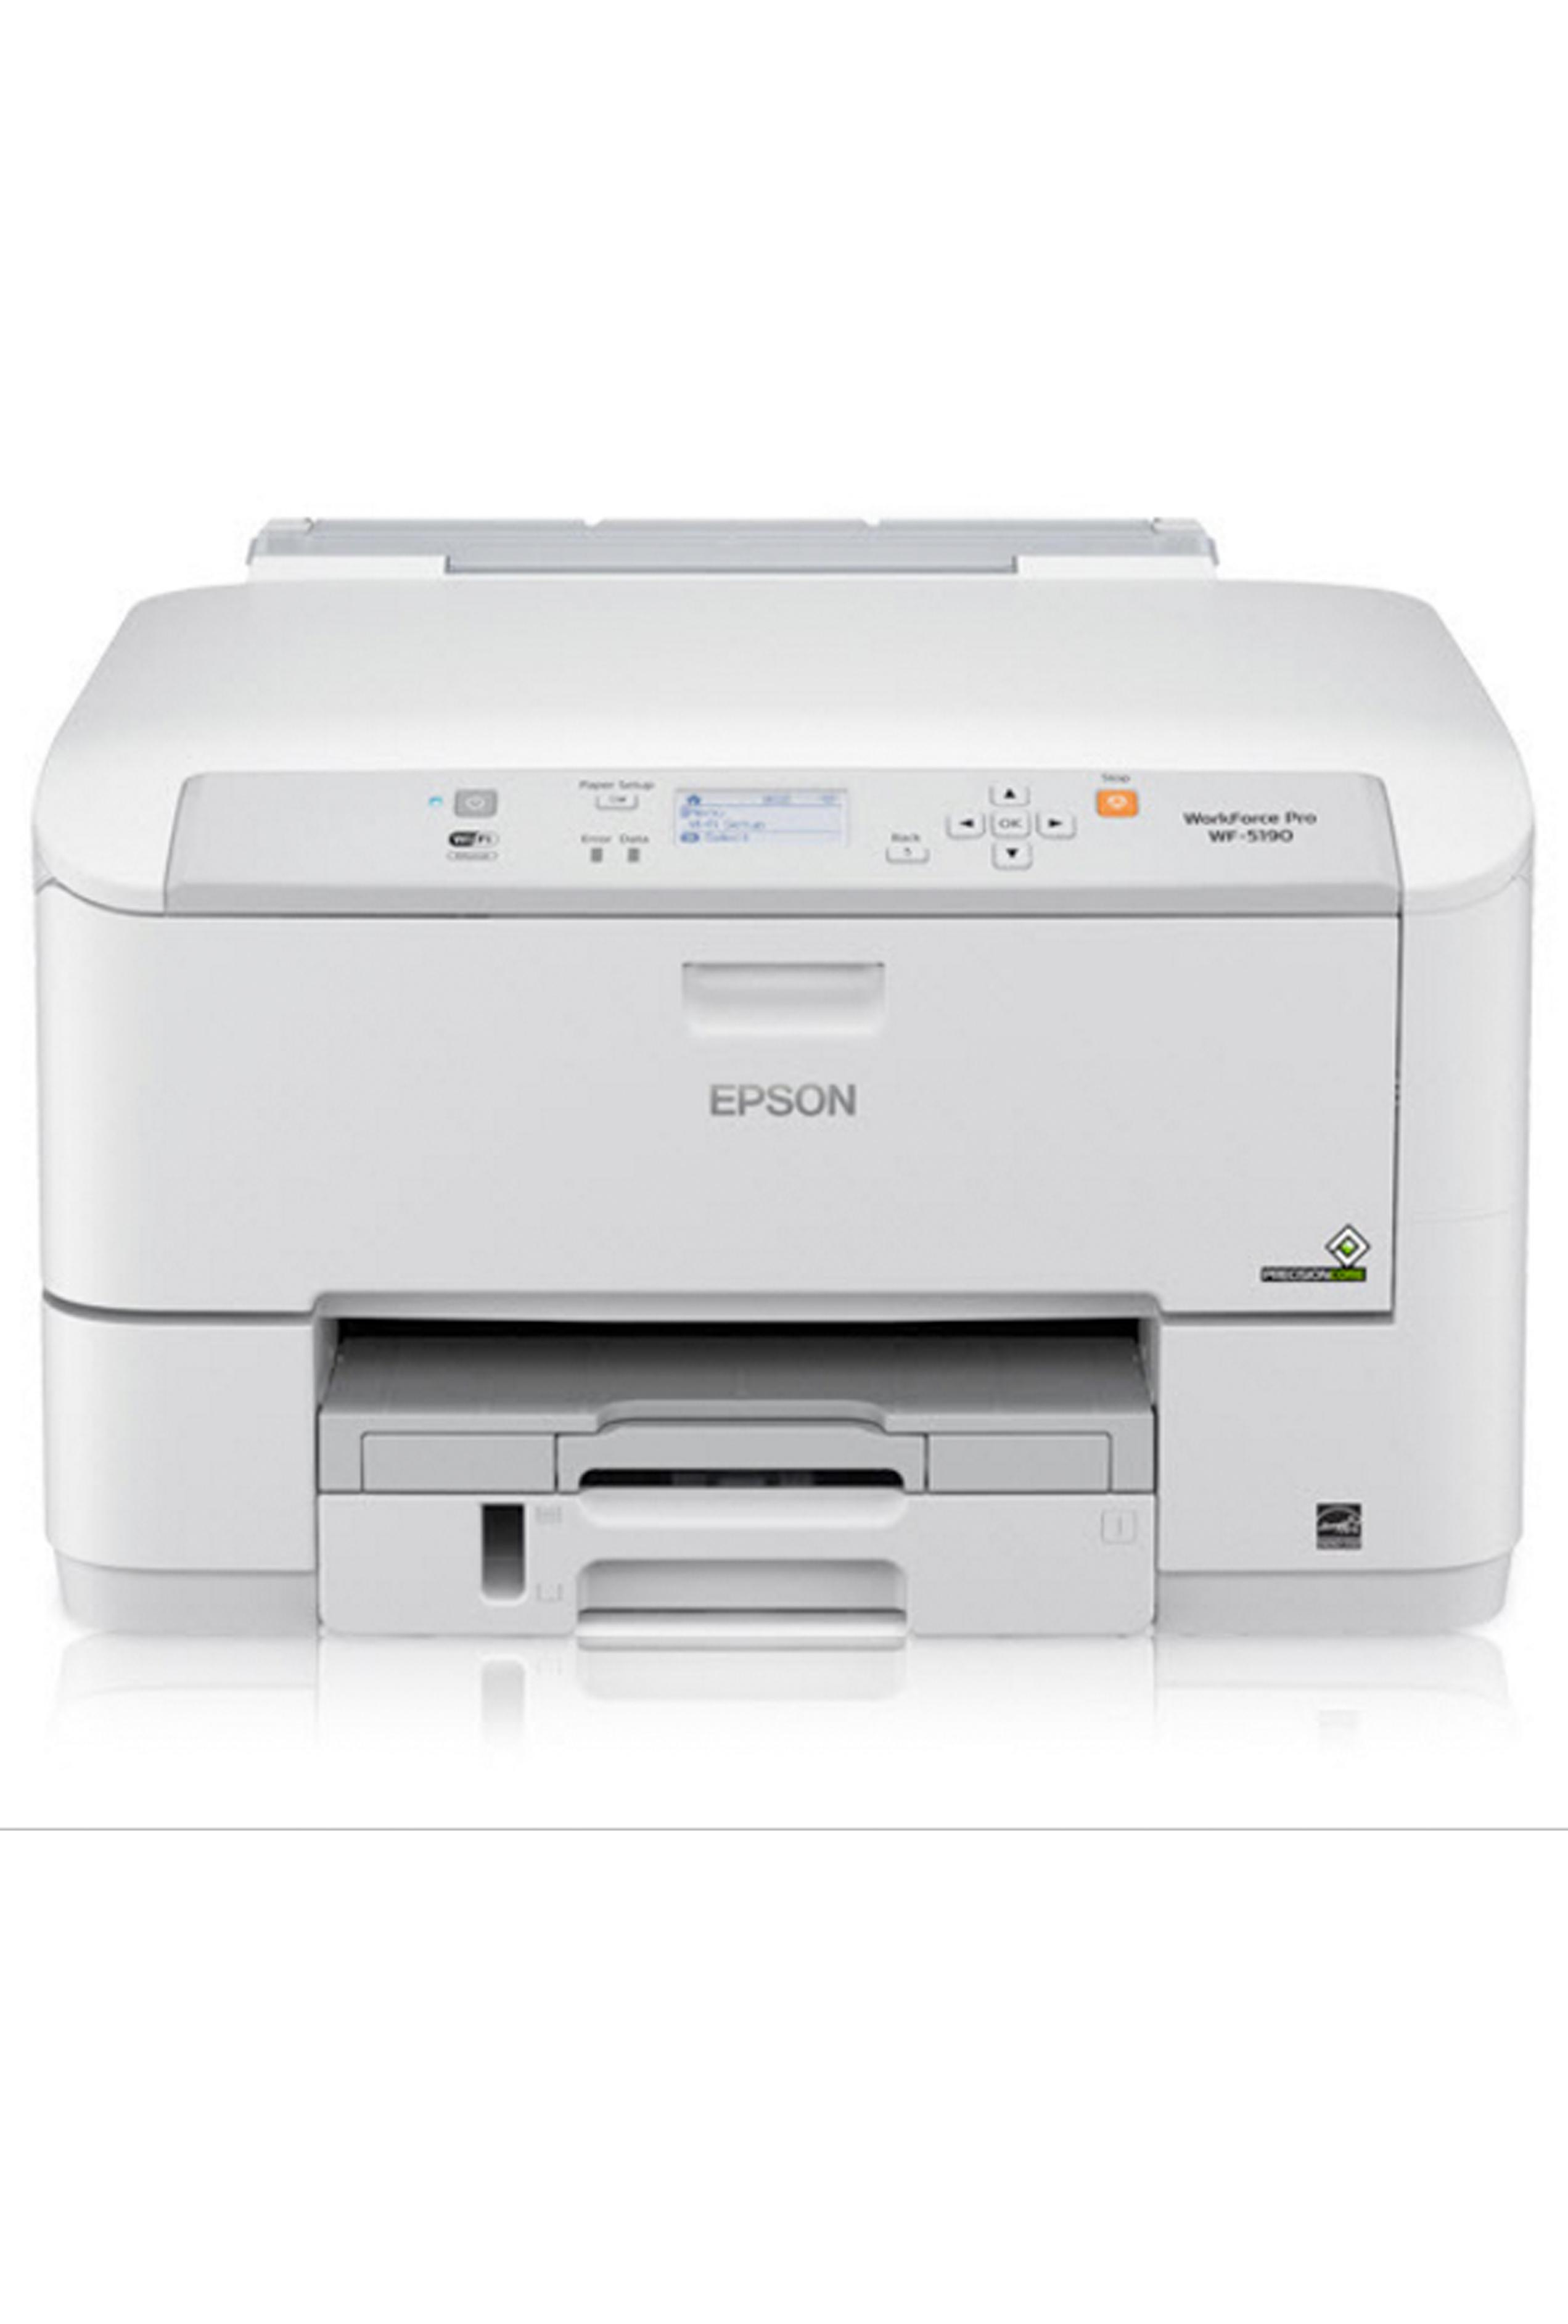 Epson WorkForce Pro WF-5190...